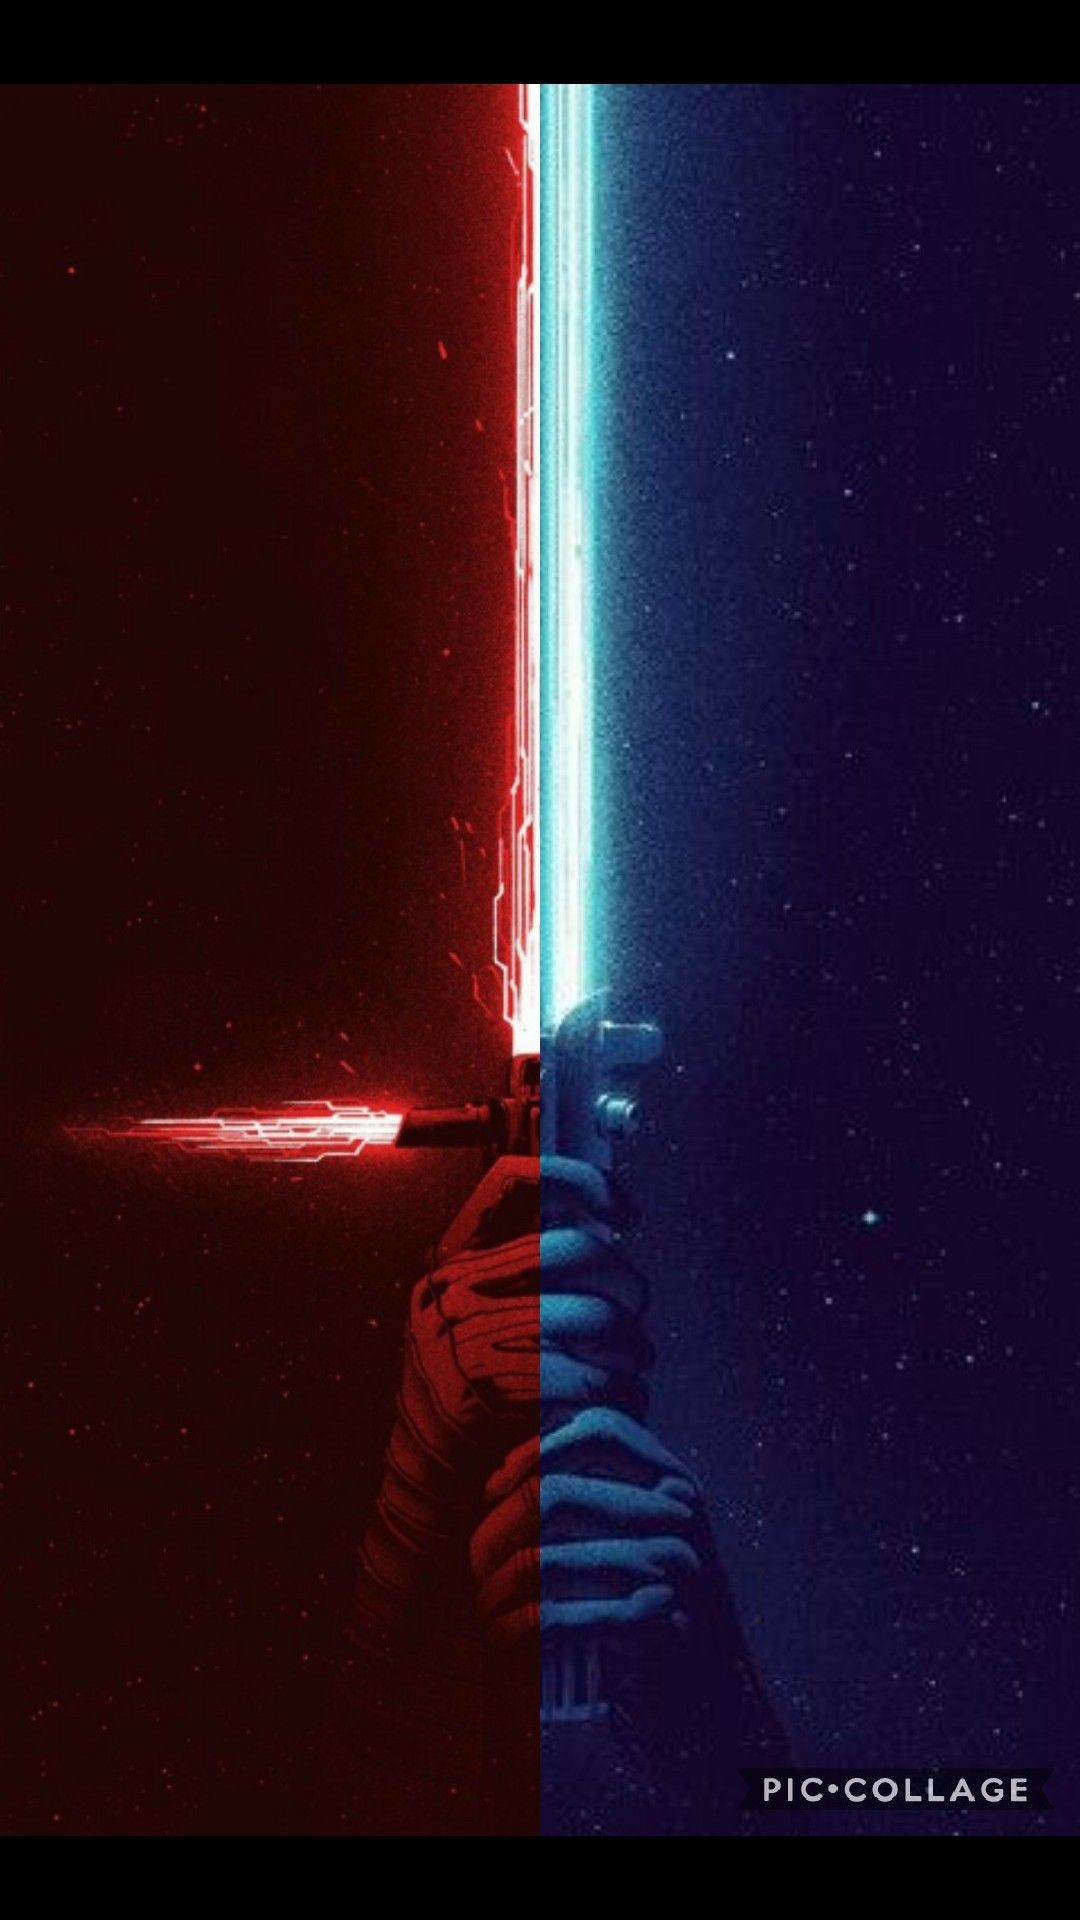 Star Wars Lightsaber Live Wallpaper